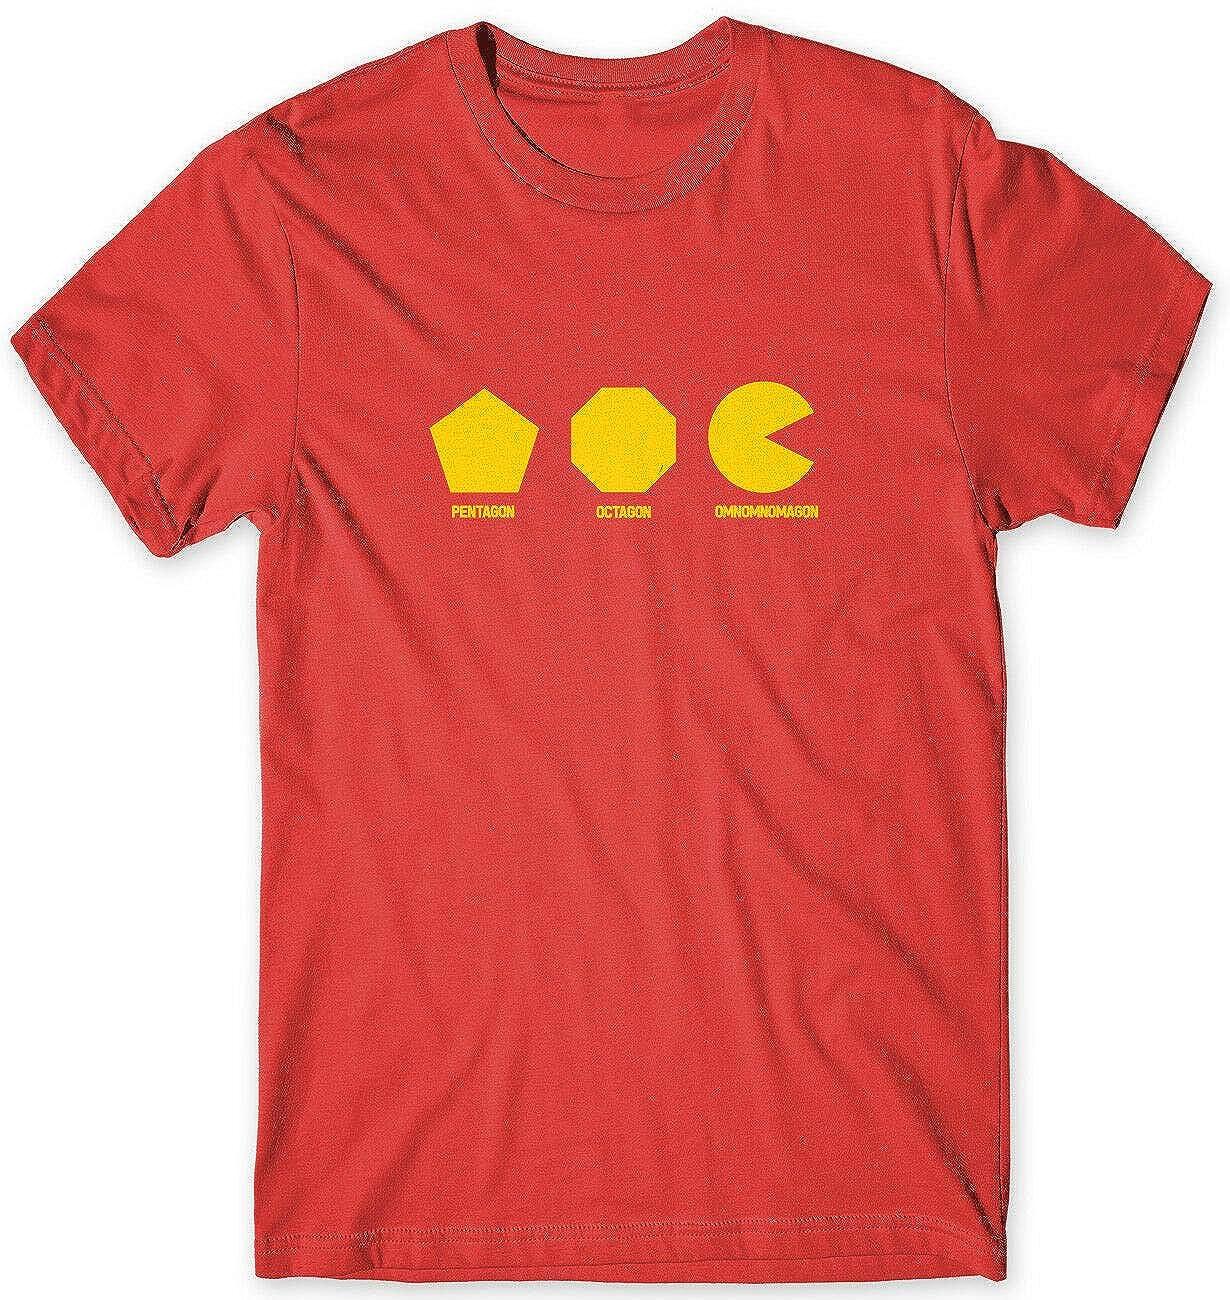 Toddrick Detalle sobre Pentagon Octagon Omnomnomagon Camiseta ...